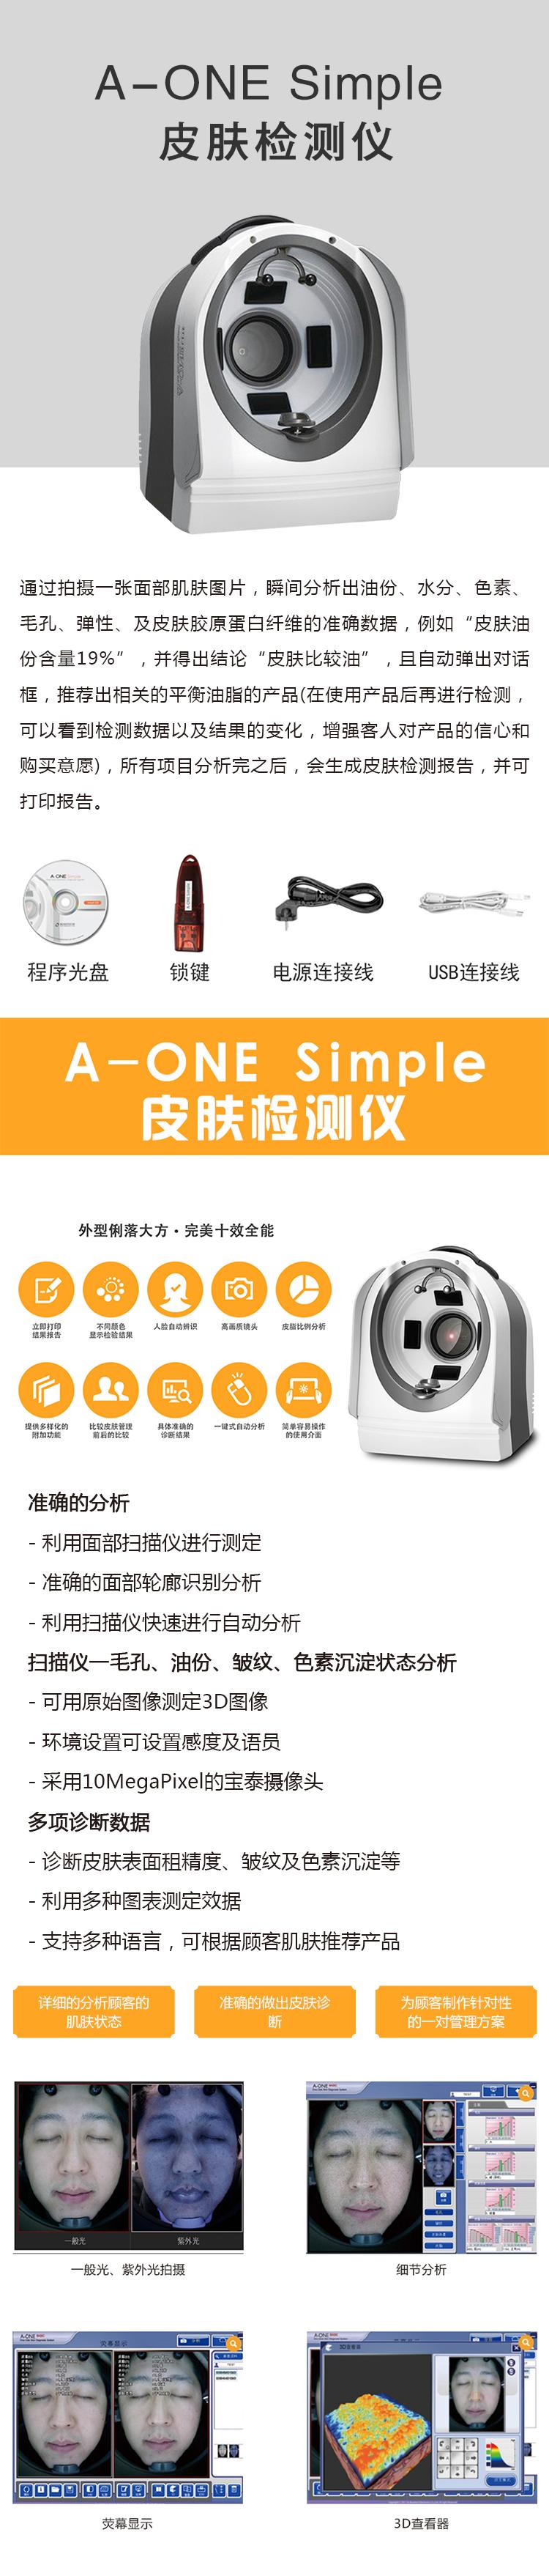 A-ONE Smart 皮肤检测仪详情.png